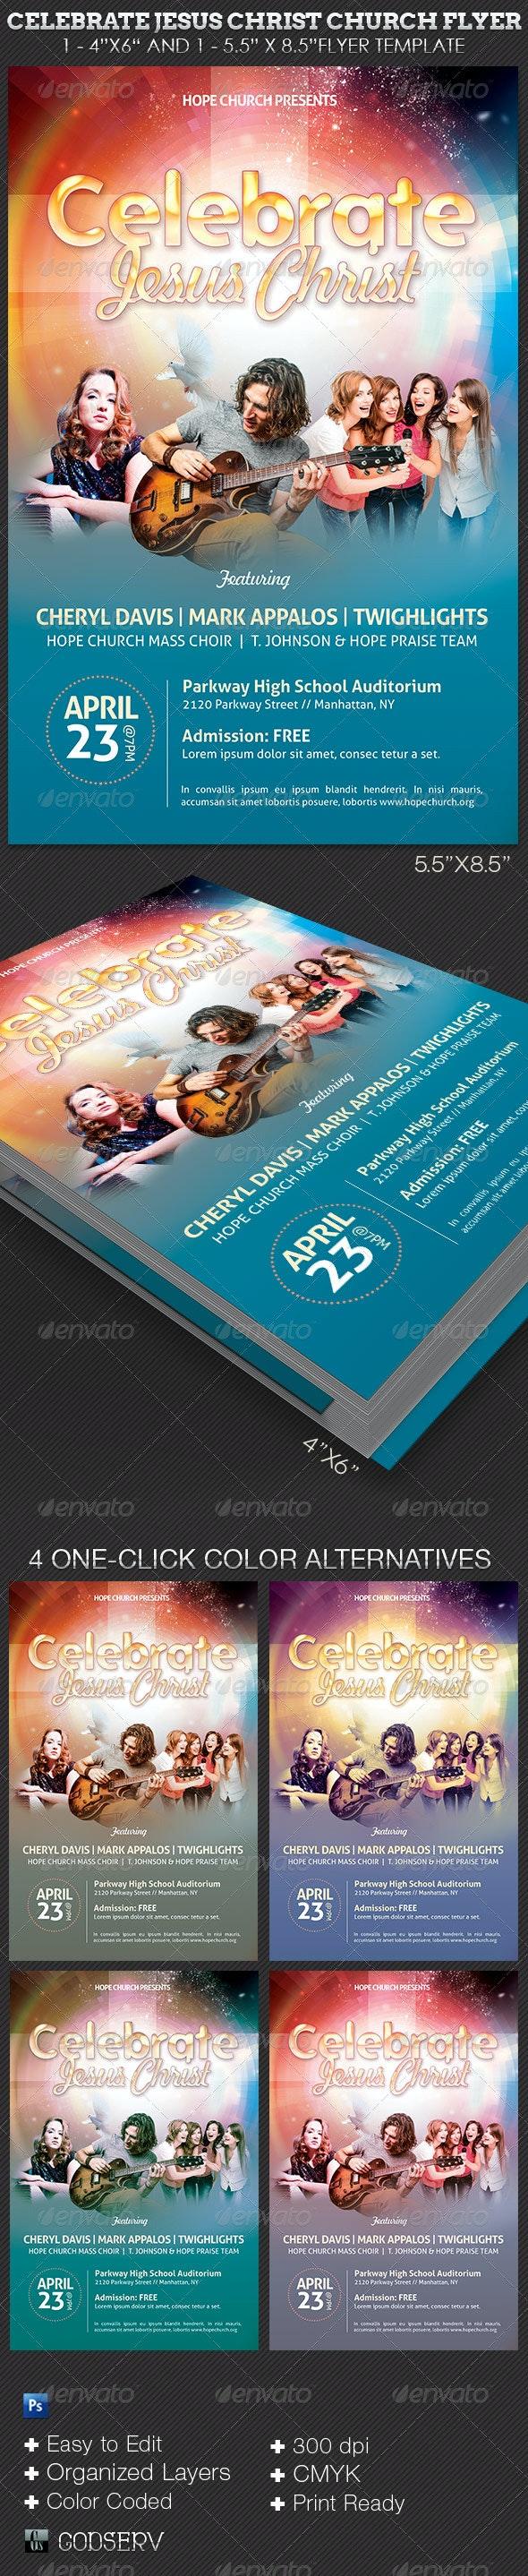 Celebrate Jesus Christ Concert Flyer Template - Church Flyers